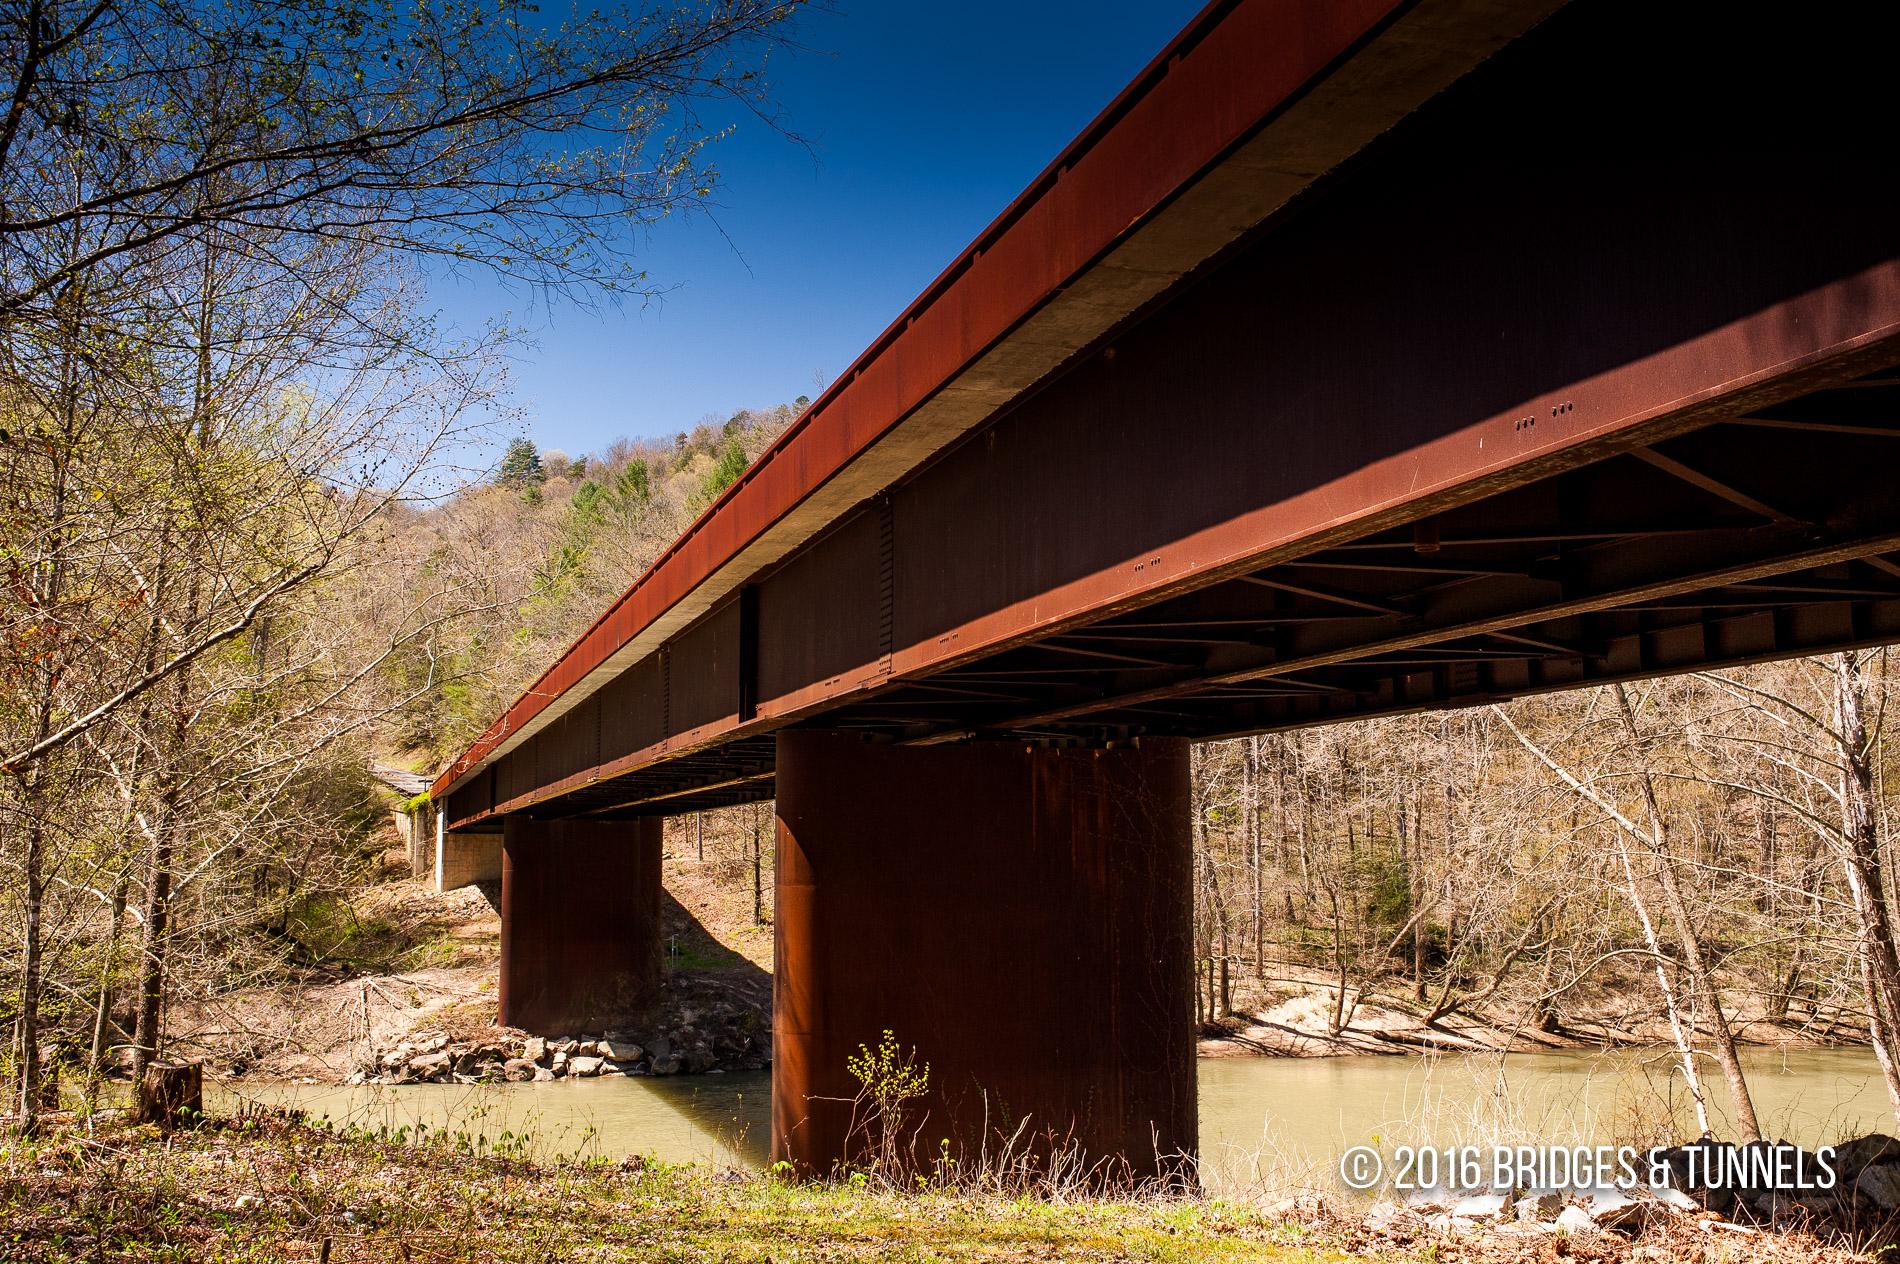 Leatherwood Bridge